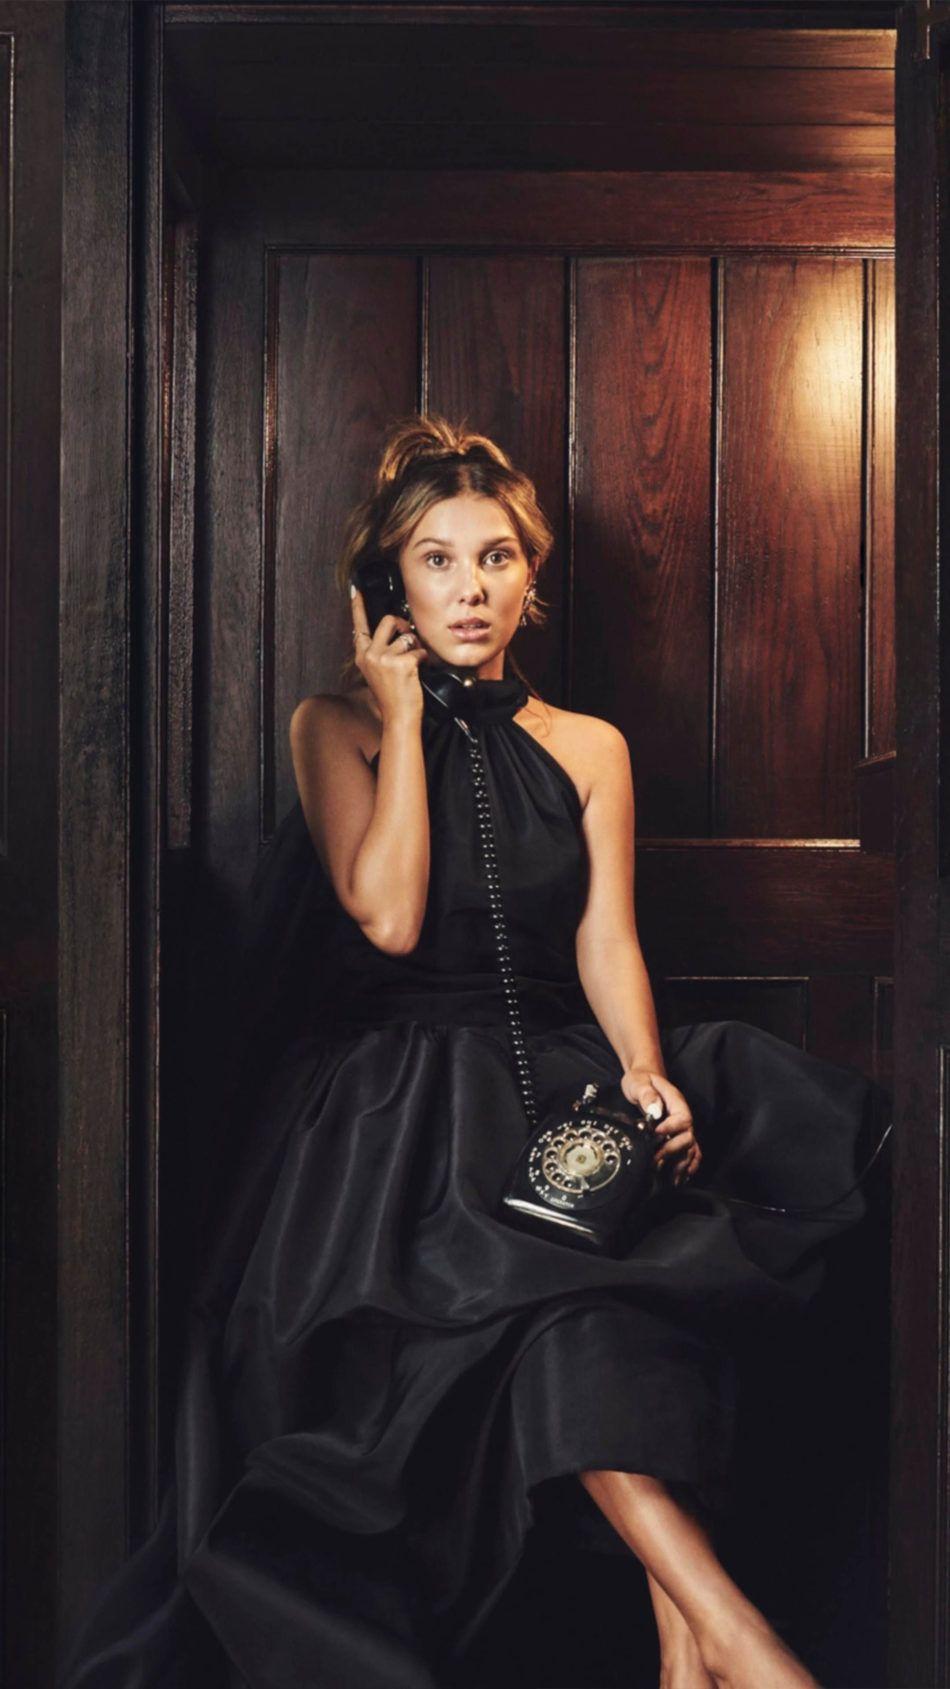 Millie Bobby Brown Black Dress Telephone 4k Ultra Hd Mobile Wallpaper In 2020 Bobby Brown Millie Bobby Brown Black Dress